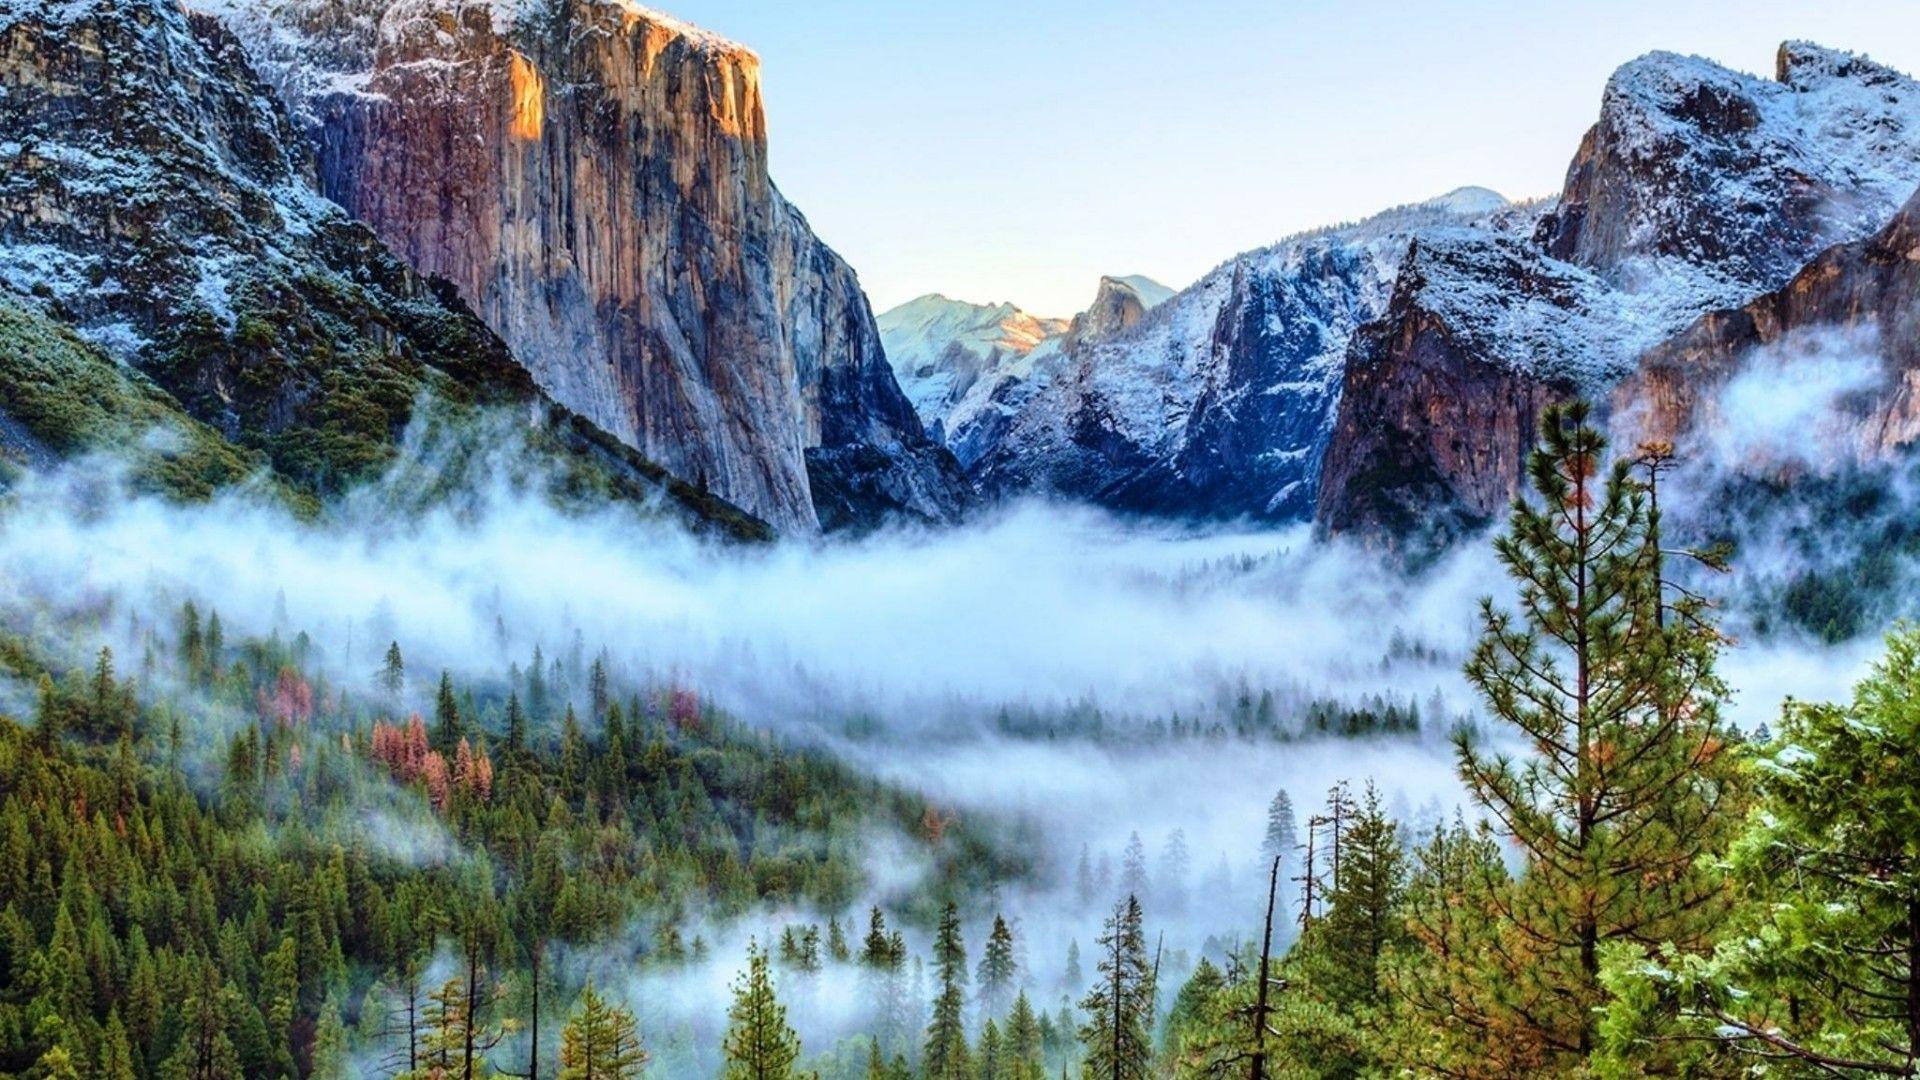 Yosemite Wallpapers Top Free Yosemite Backgrounds